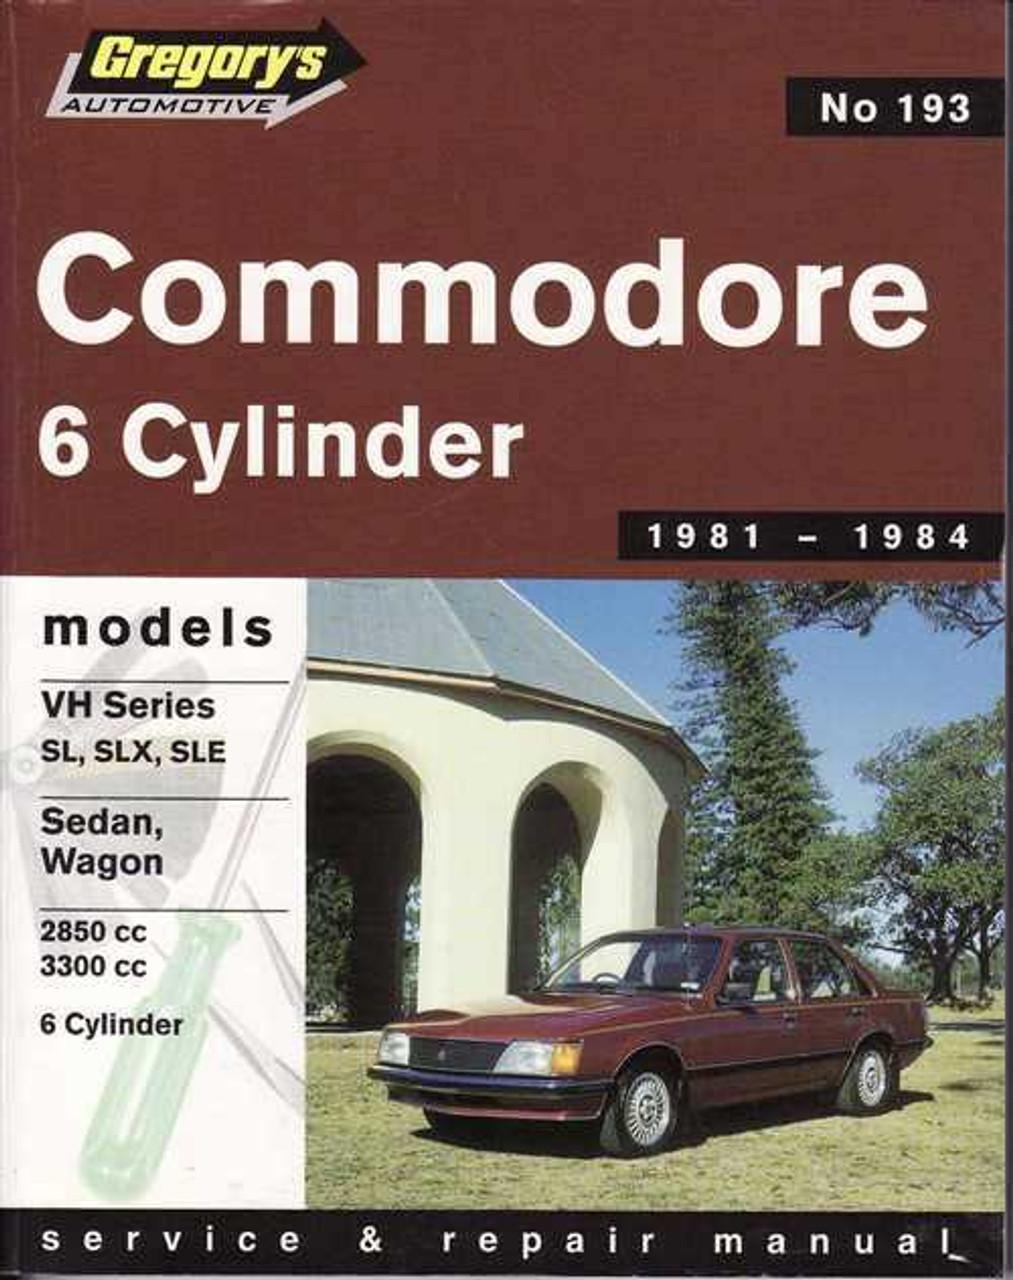 holden commodore vh series sl slx sle 6 cylinder 1981 1984 rh automotobookshop com au vk commodore workshop manual pdf vk commodore workshop manual free